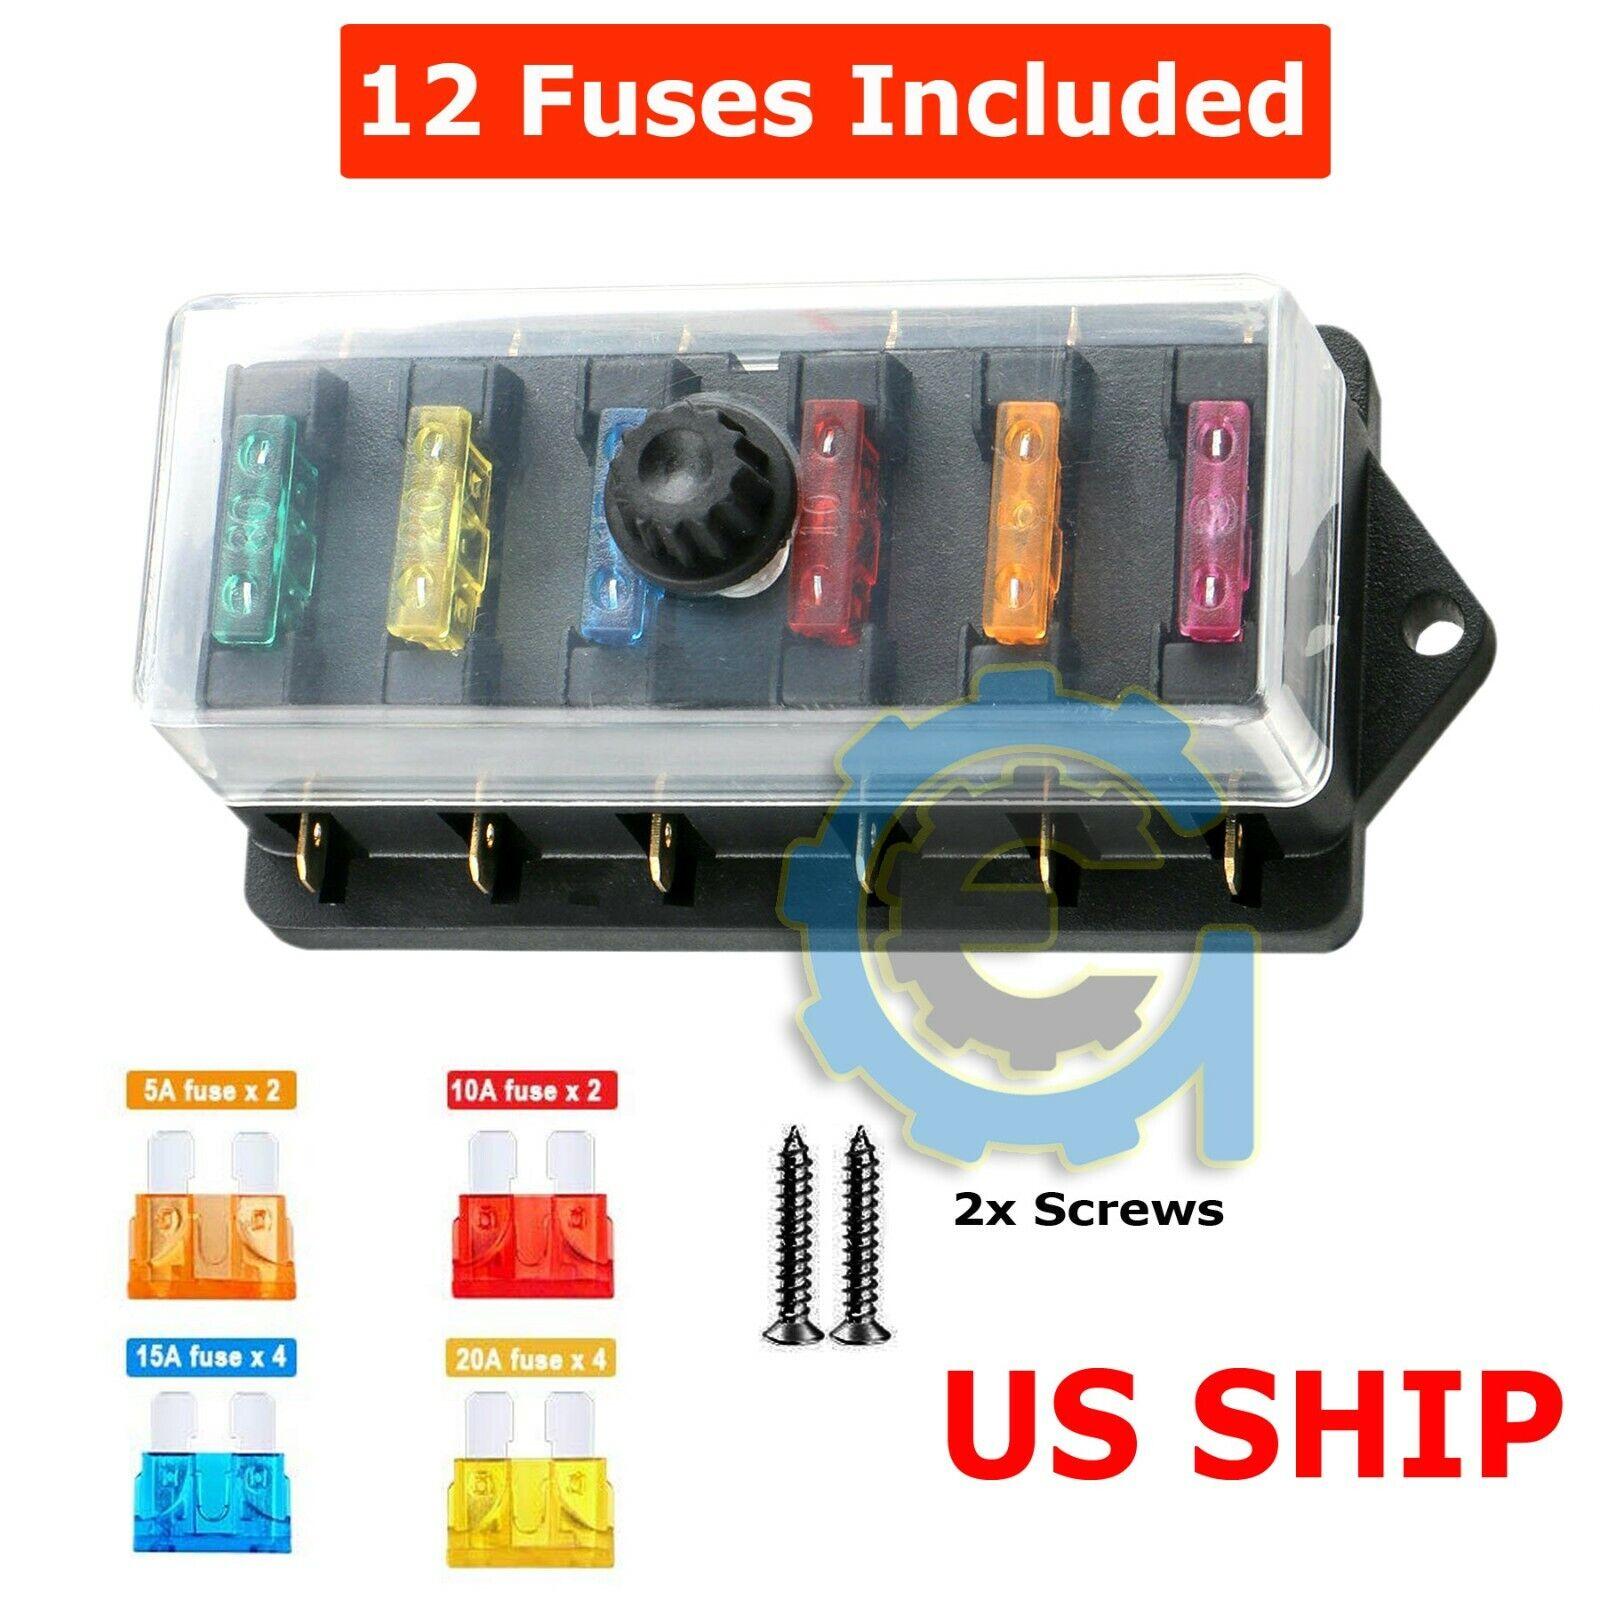 6 Way Blade Fuse Box & Bus Bar Car Kit With Cover Marine FUSEBOX Holder 32v  for sale online | eBayeBay